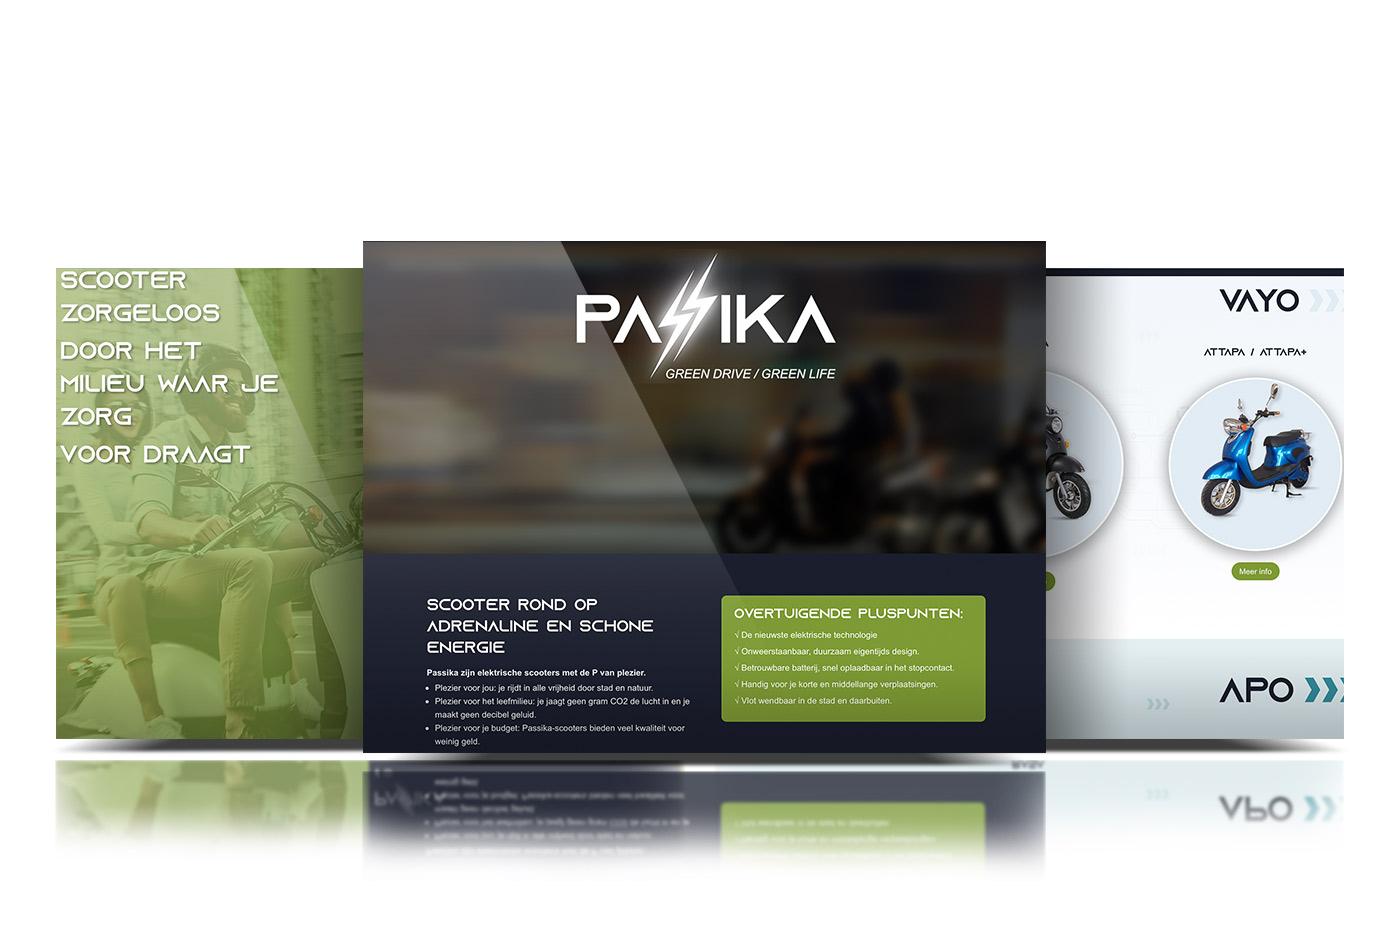 mark-up-agency-webdesign-presentatie-passika